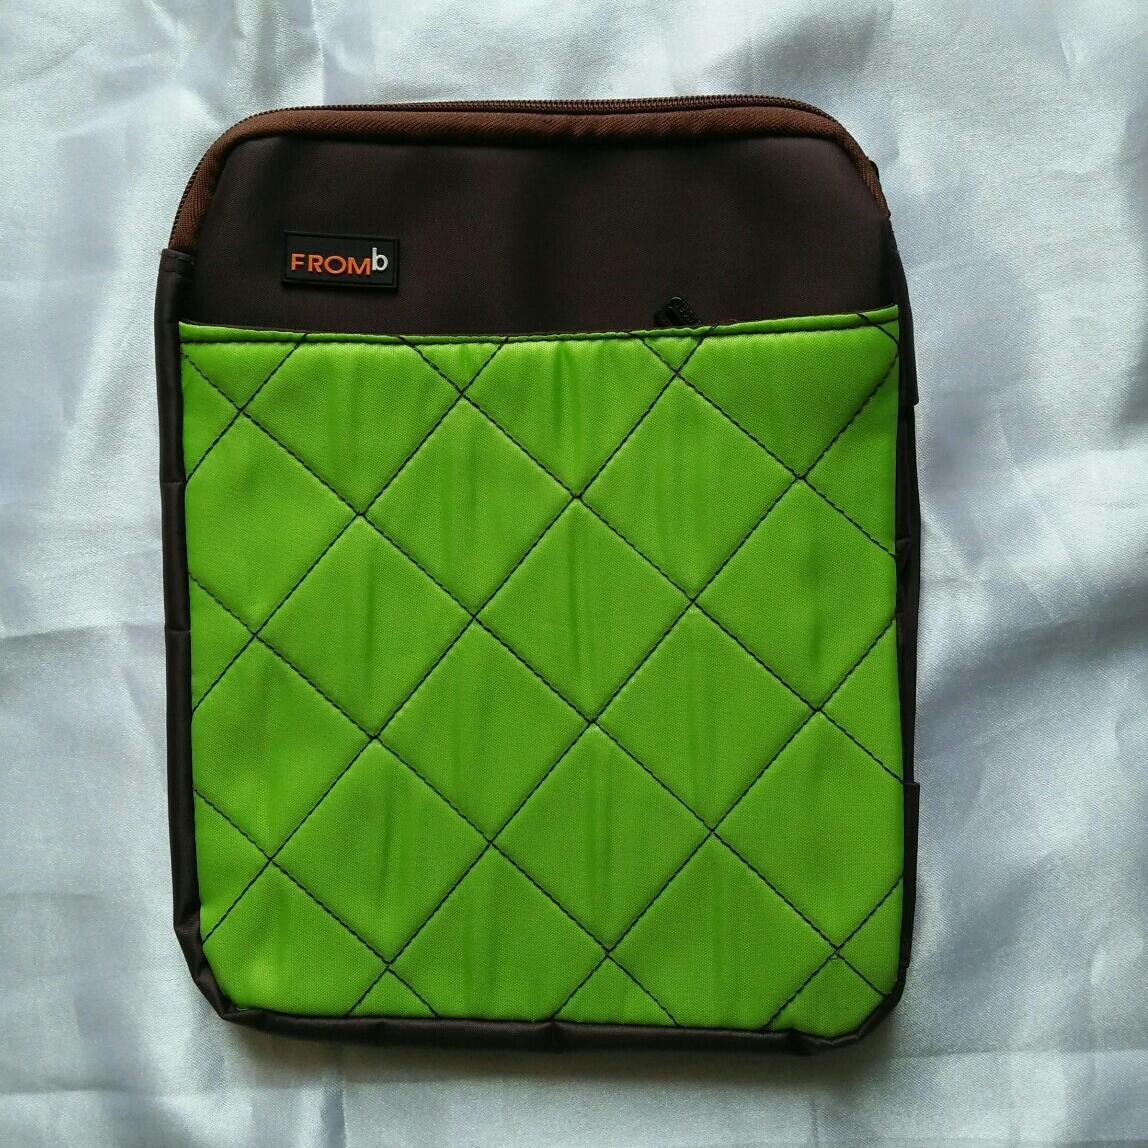 Pouch ipad organizer dompet hp hijau neon